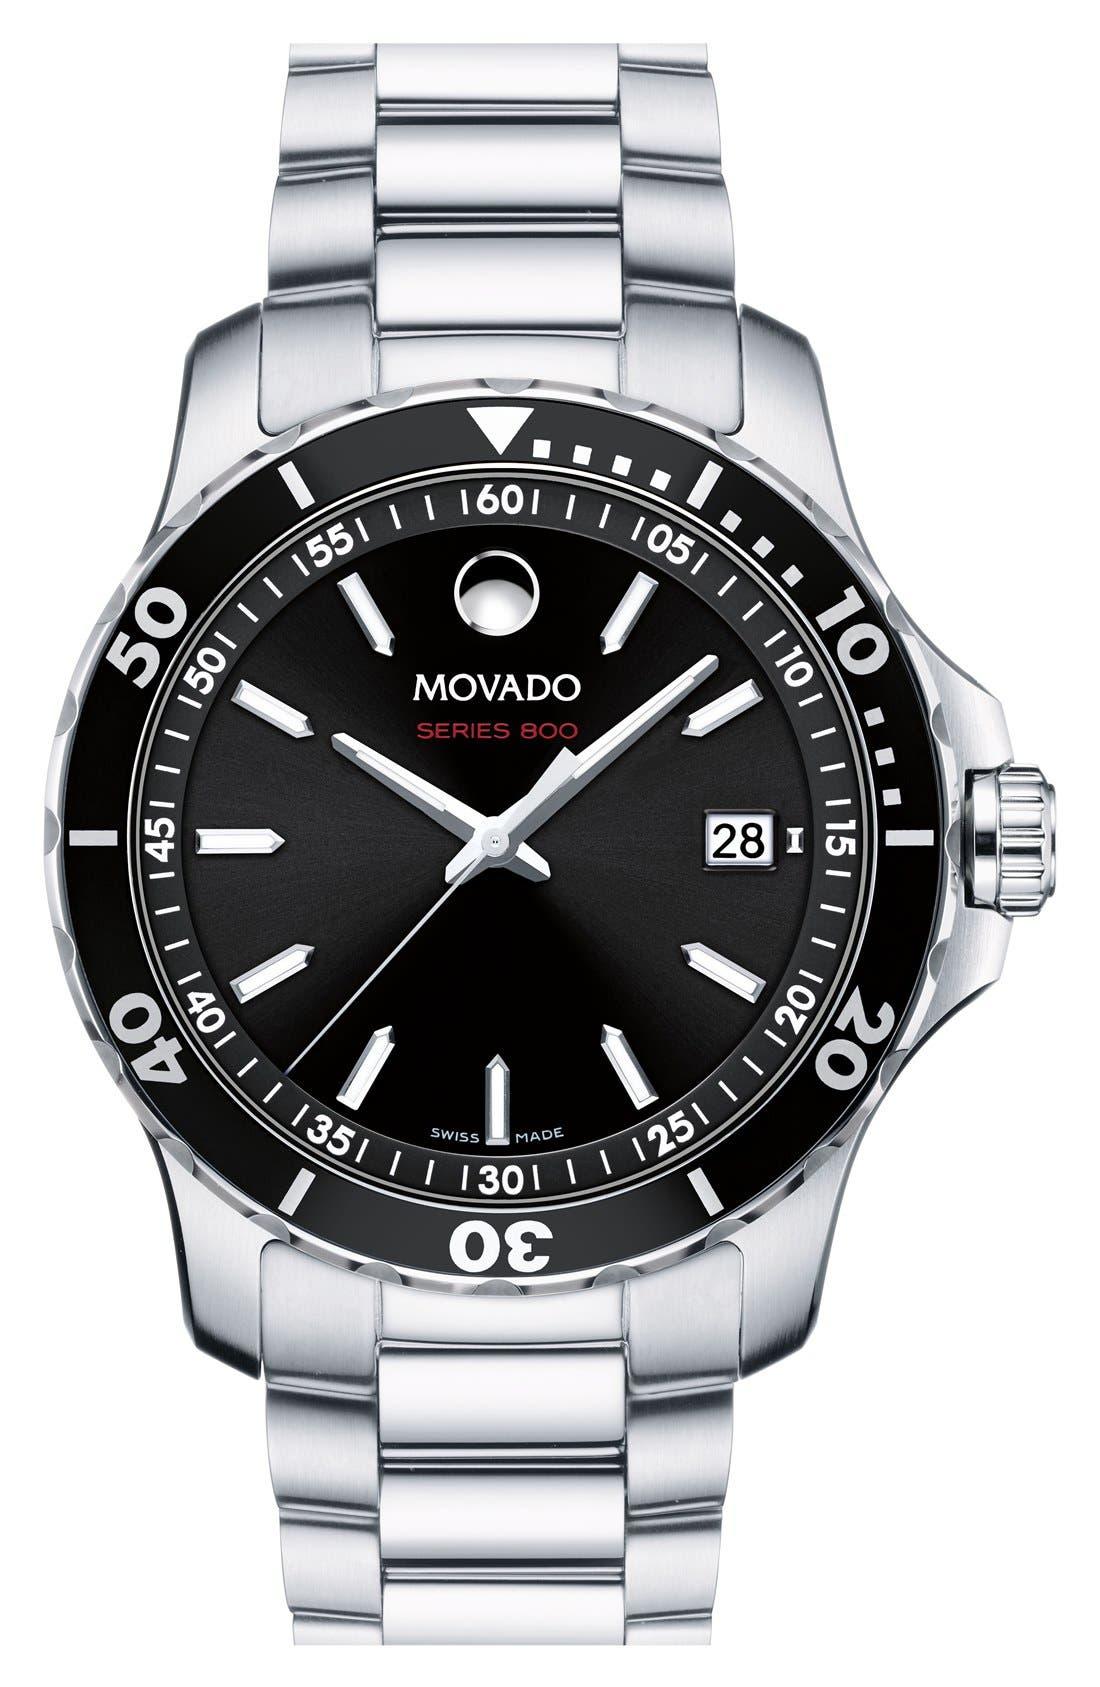 Main Image - Movado 'Series 800' Bracelet Watch, 40mm